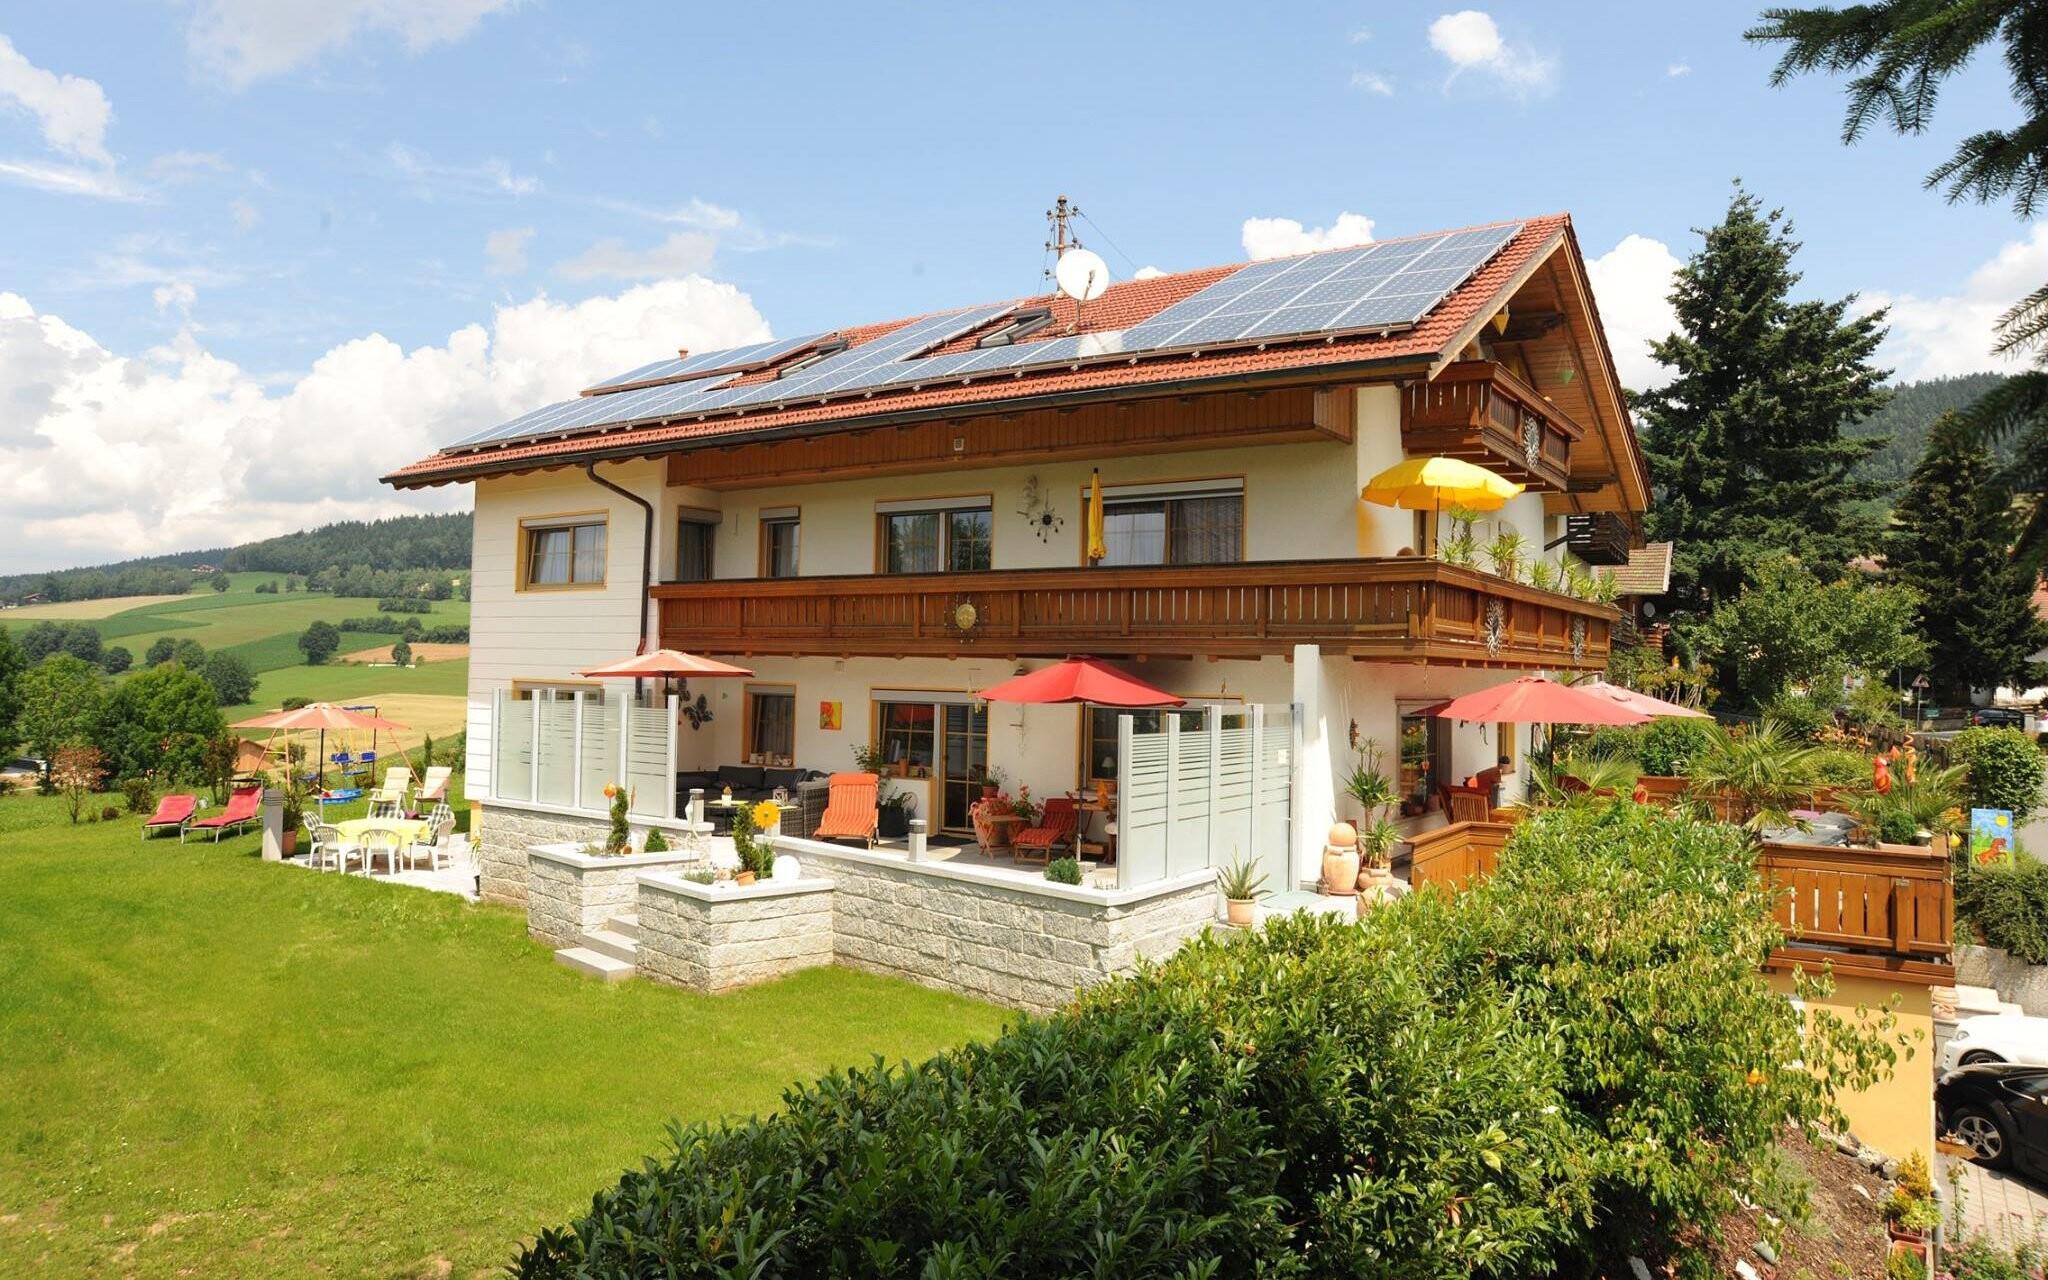 Hotel Rösslwirt ***, Lam, Bavorský les, Německo